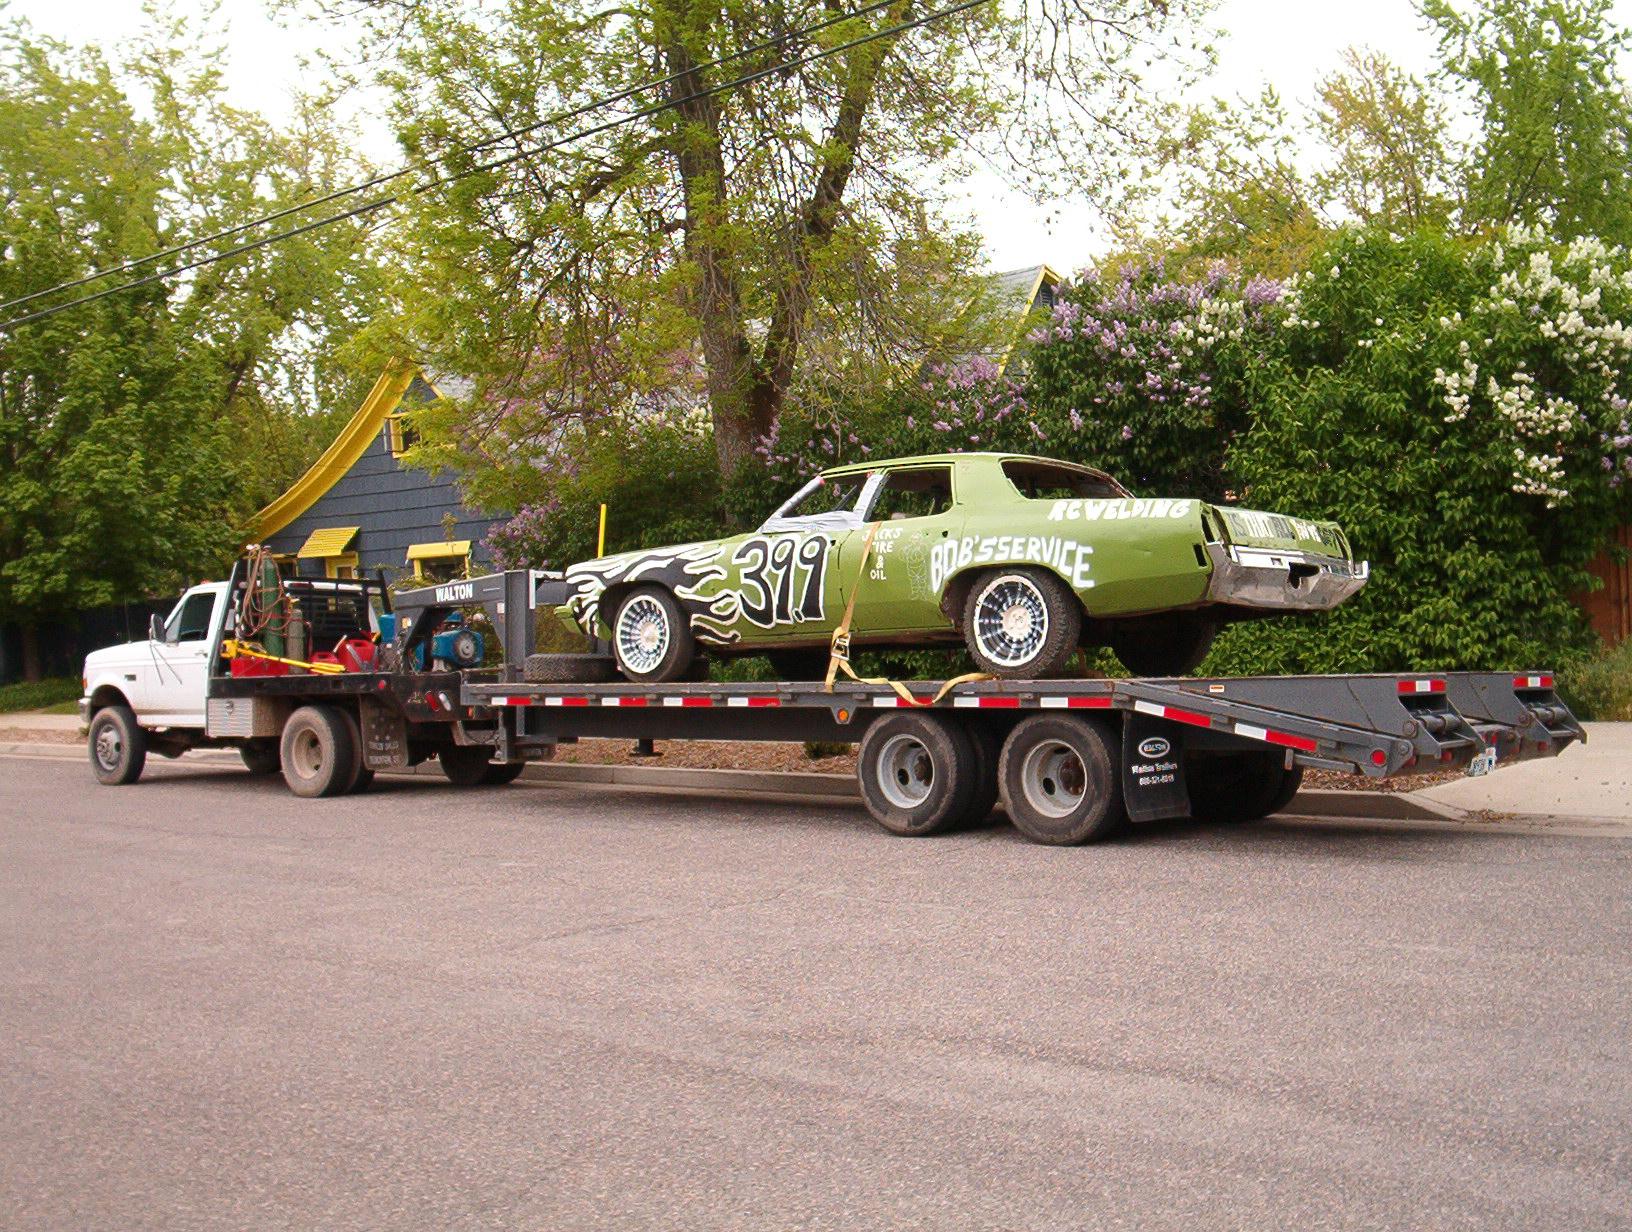 Building Demolition Derby Car : The real demolition derby cars